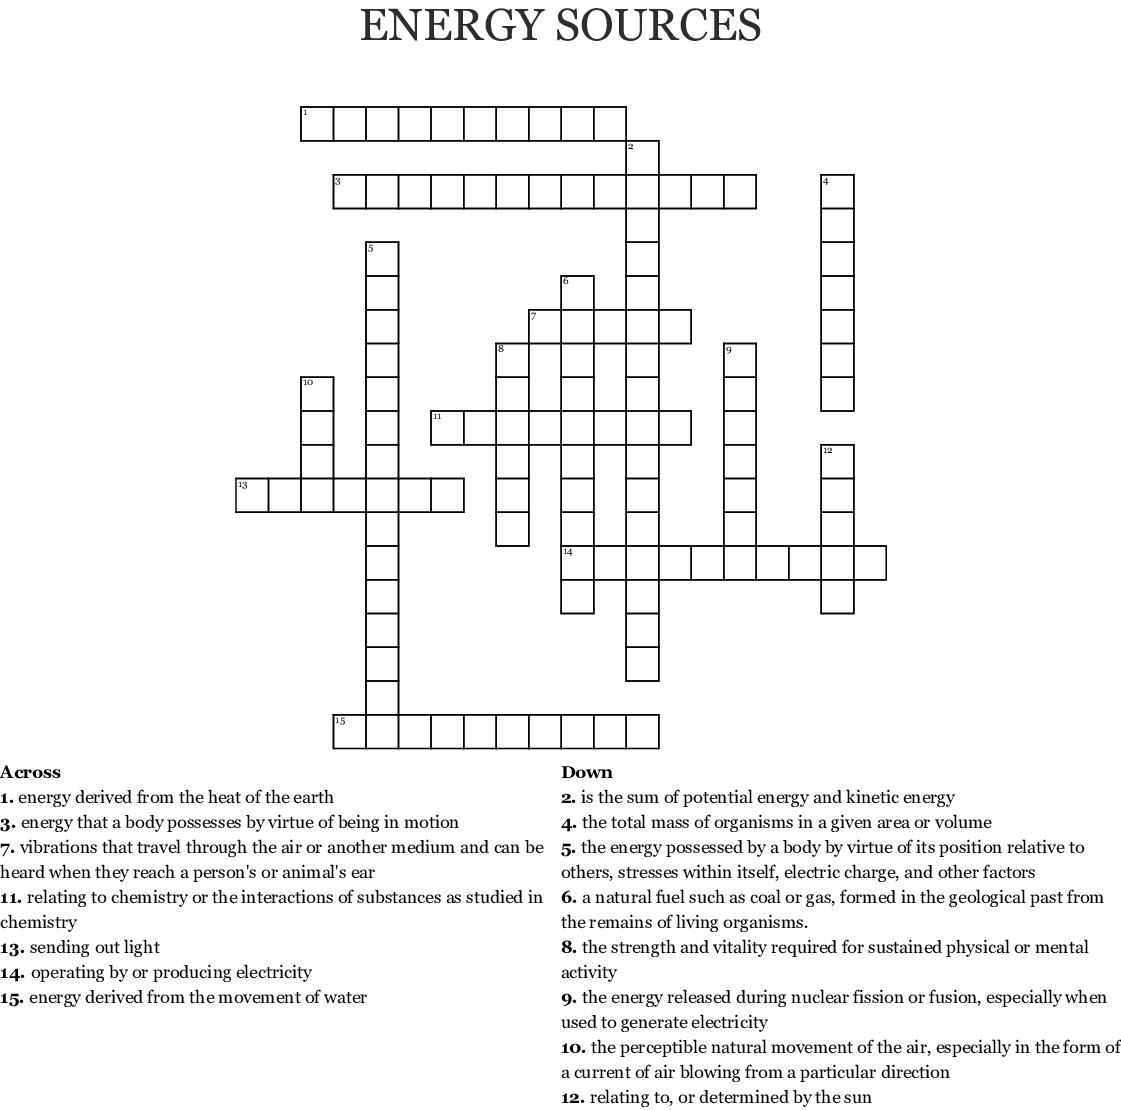 Energy Sources Crossword